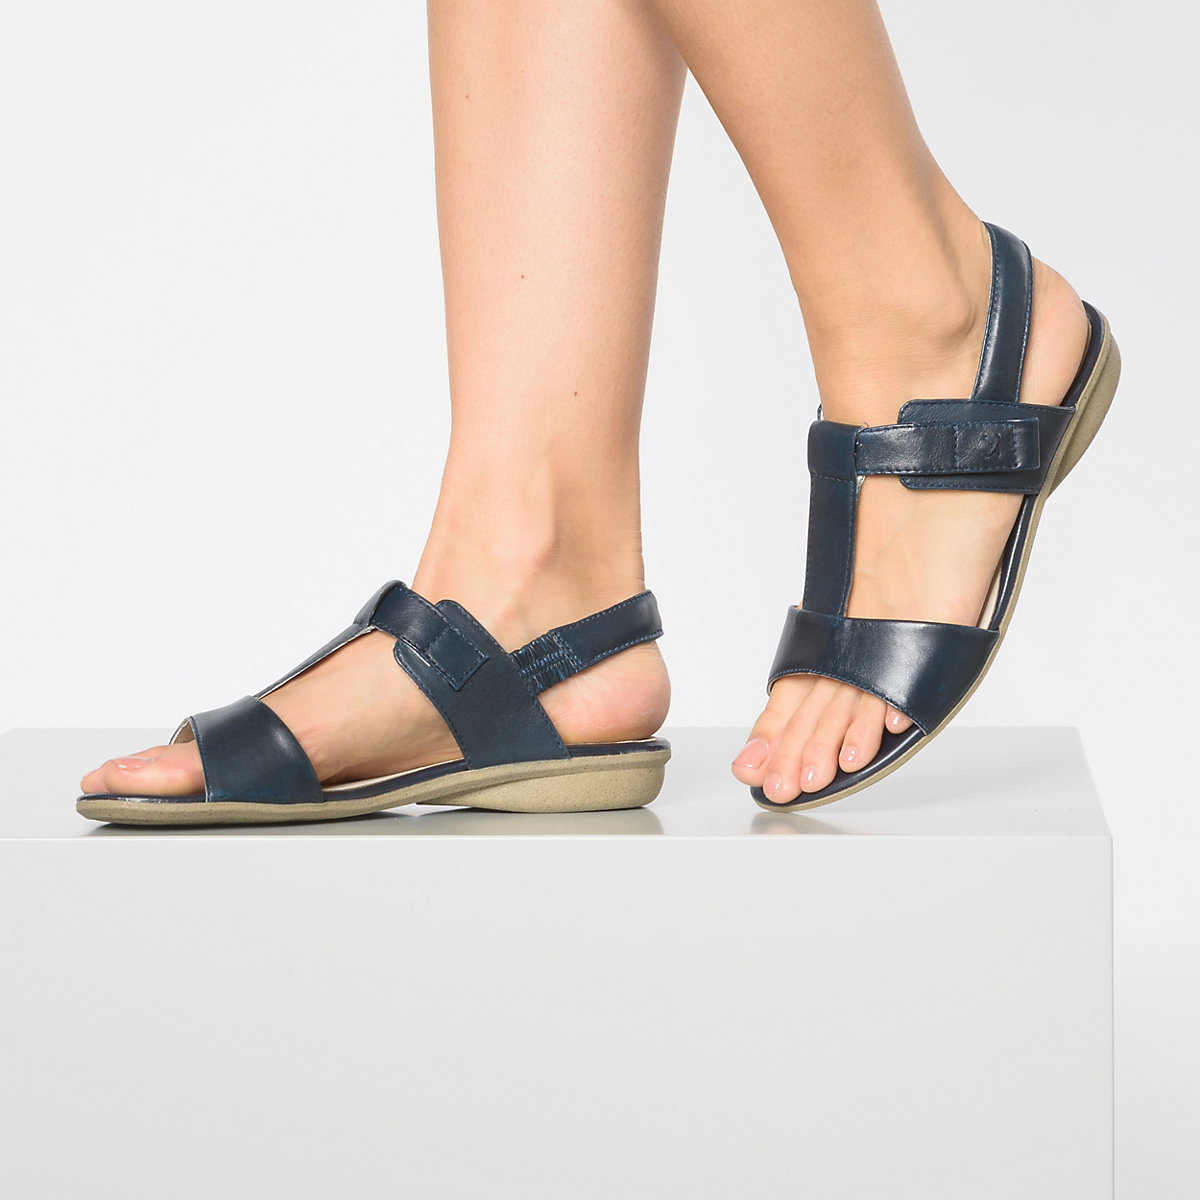 Josef Seibel, Fabia 16 T-steg-sandalen, Dunkelblau